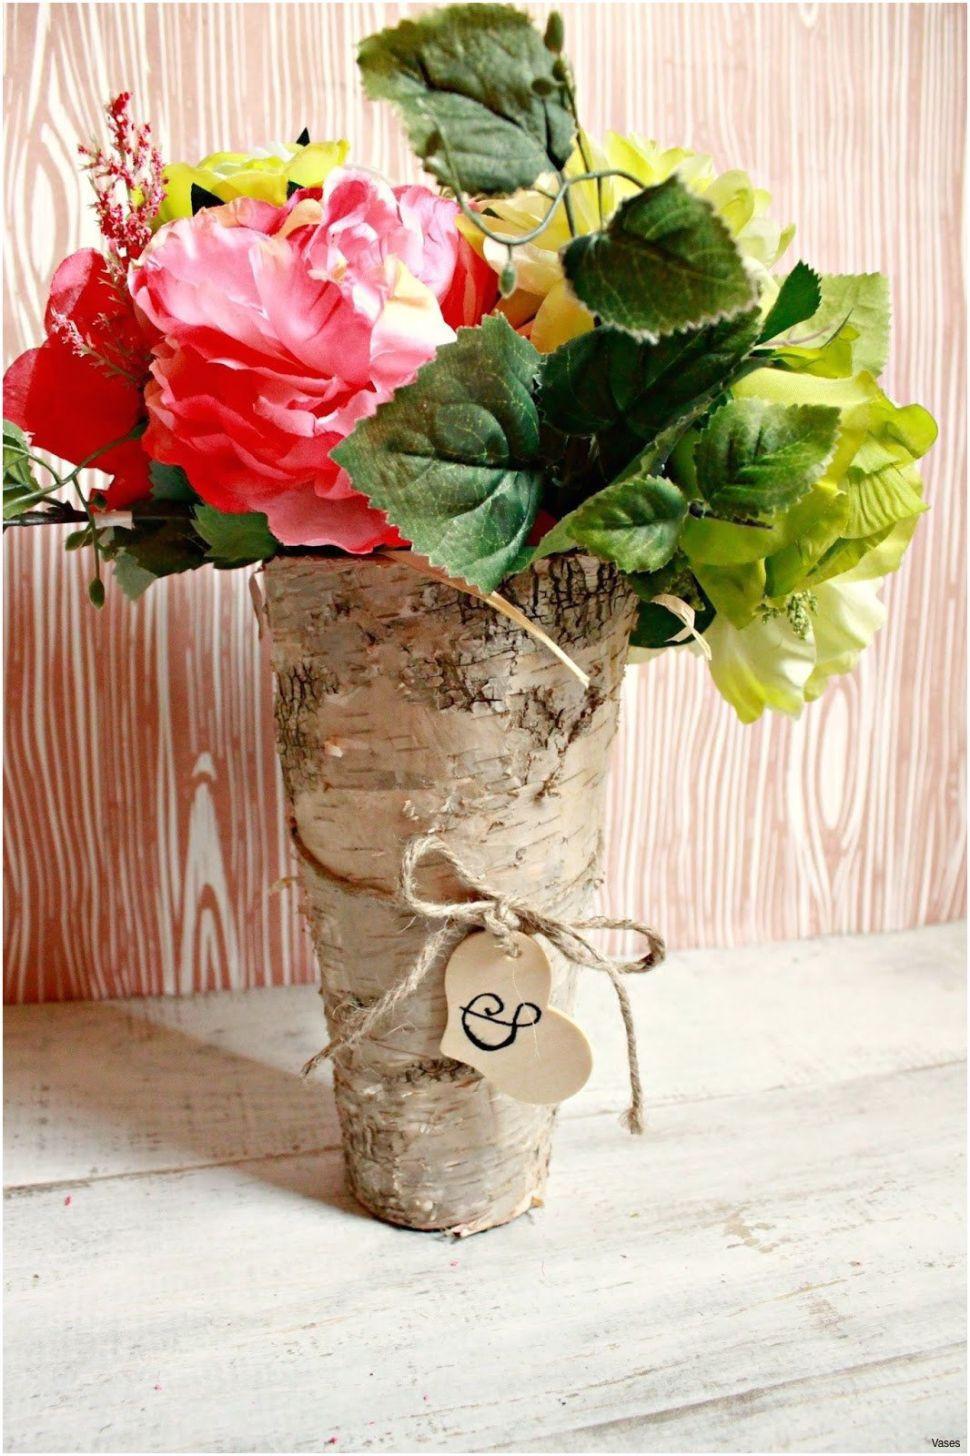 vase with stand of vase with stand pics silk bouquets h vases diy wood vase i 0d base inside vase with stand pics silk bouquets h vases diy wood vase i 0d base turntable baseboard